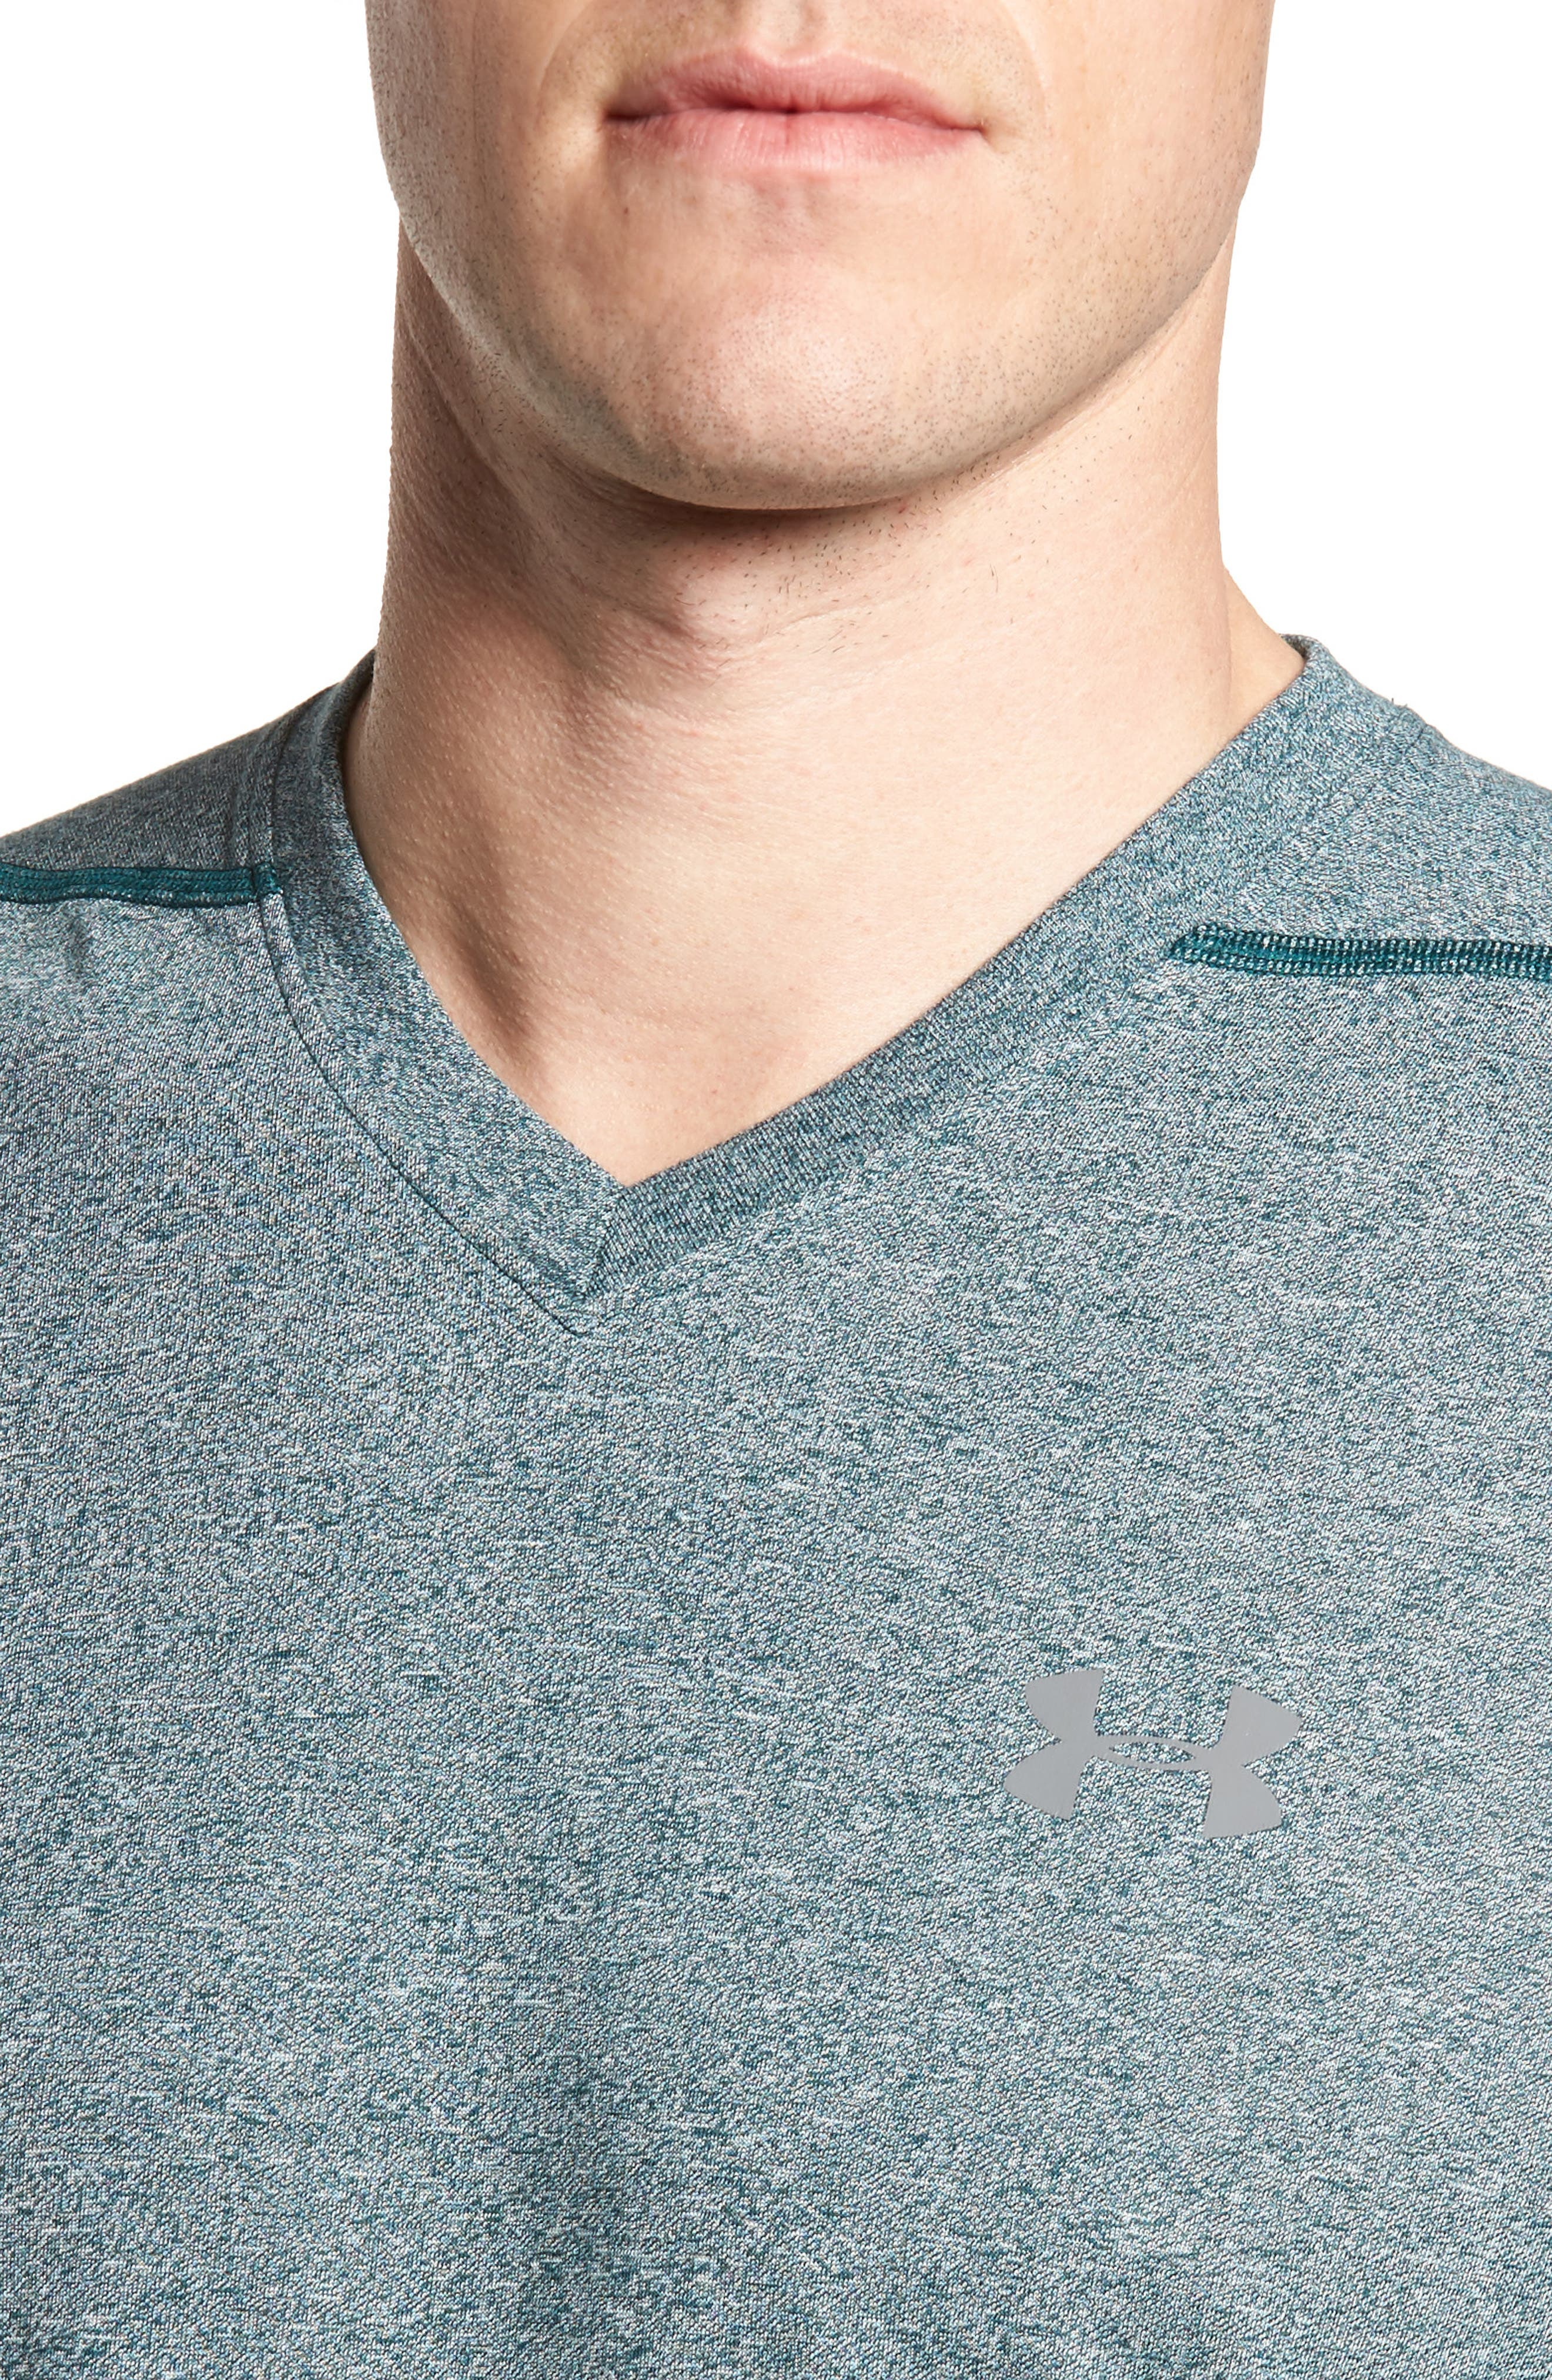 Regular Fit Threadborne T-Shirt,                             Alternate thumbnail 4, color,                             300